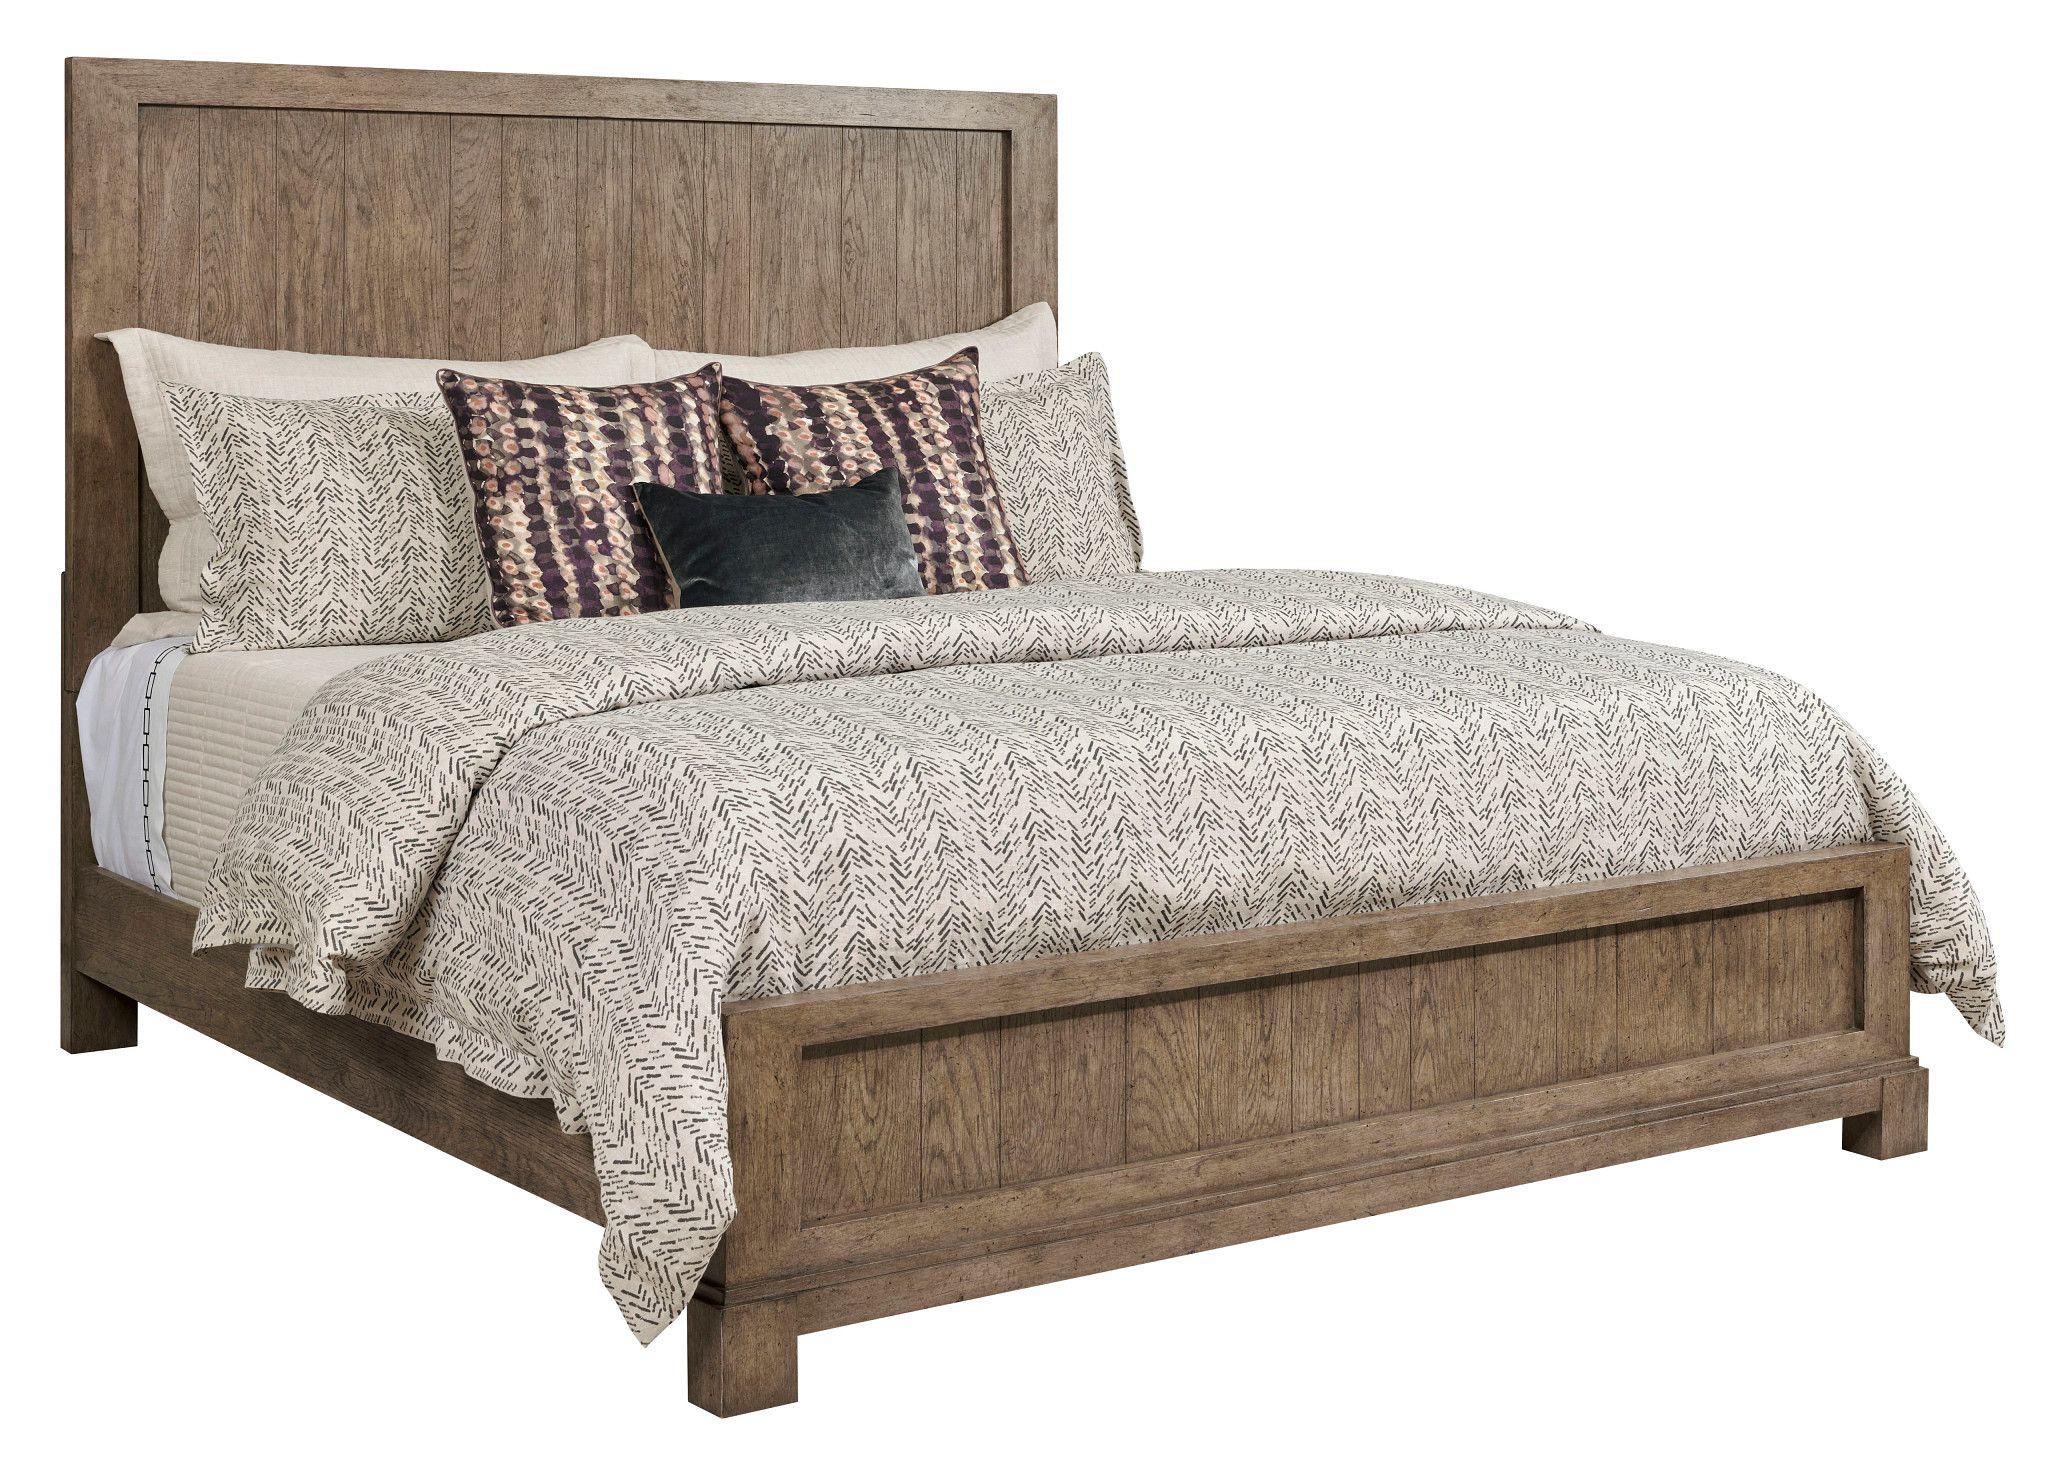 King Trenton Panel Bed